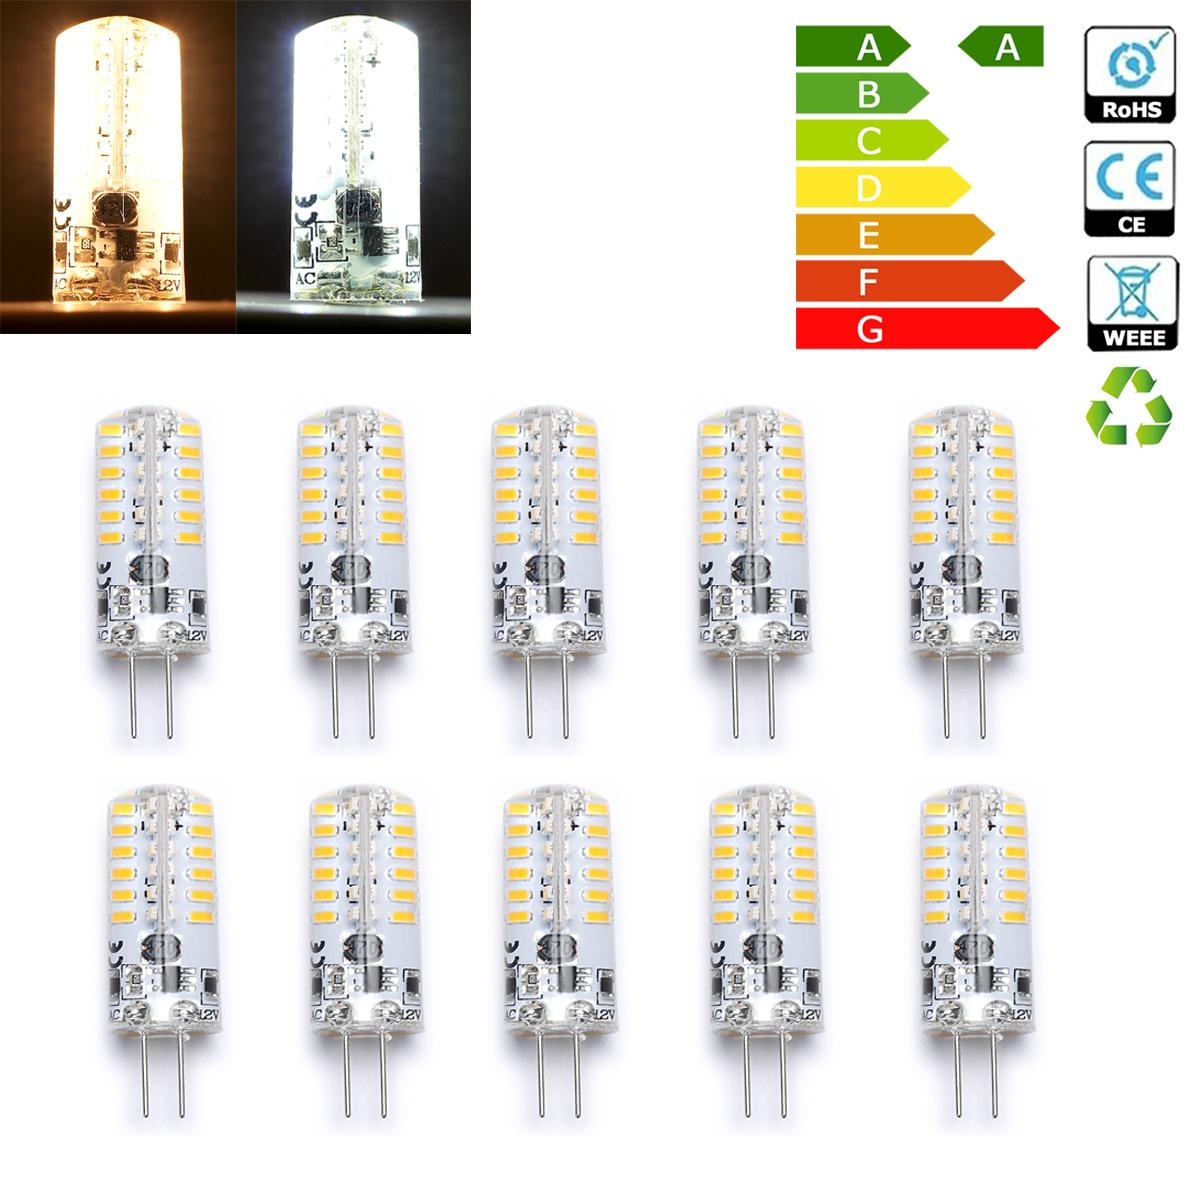 wow 10 x g4 3w 48 led 3014 smd capsule bulb spot light energy saving ac dc 12v ebay. Black Bedroom Furniture Sets. Home Design Ideas